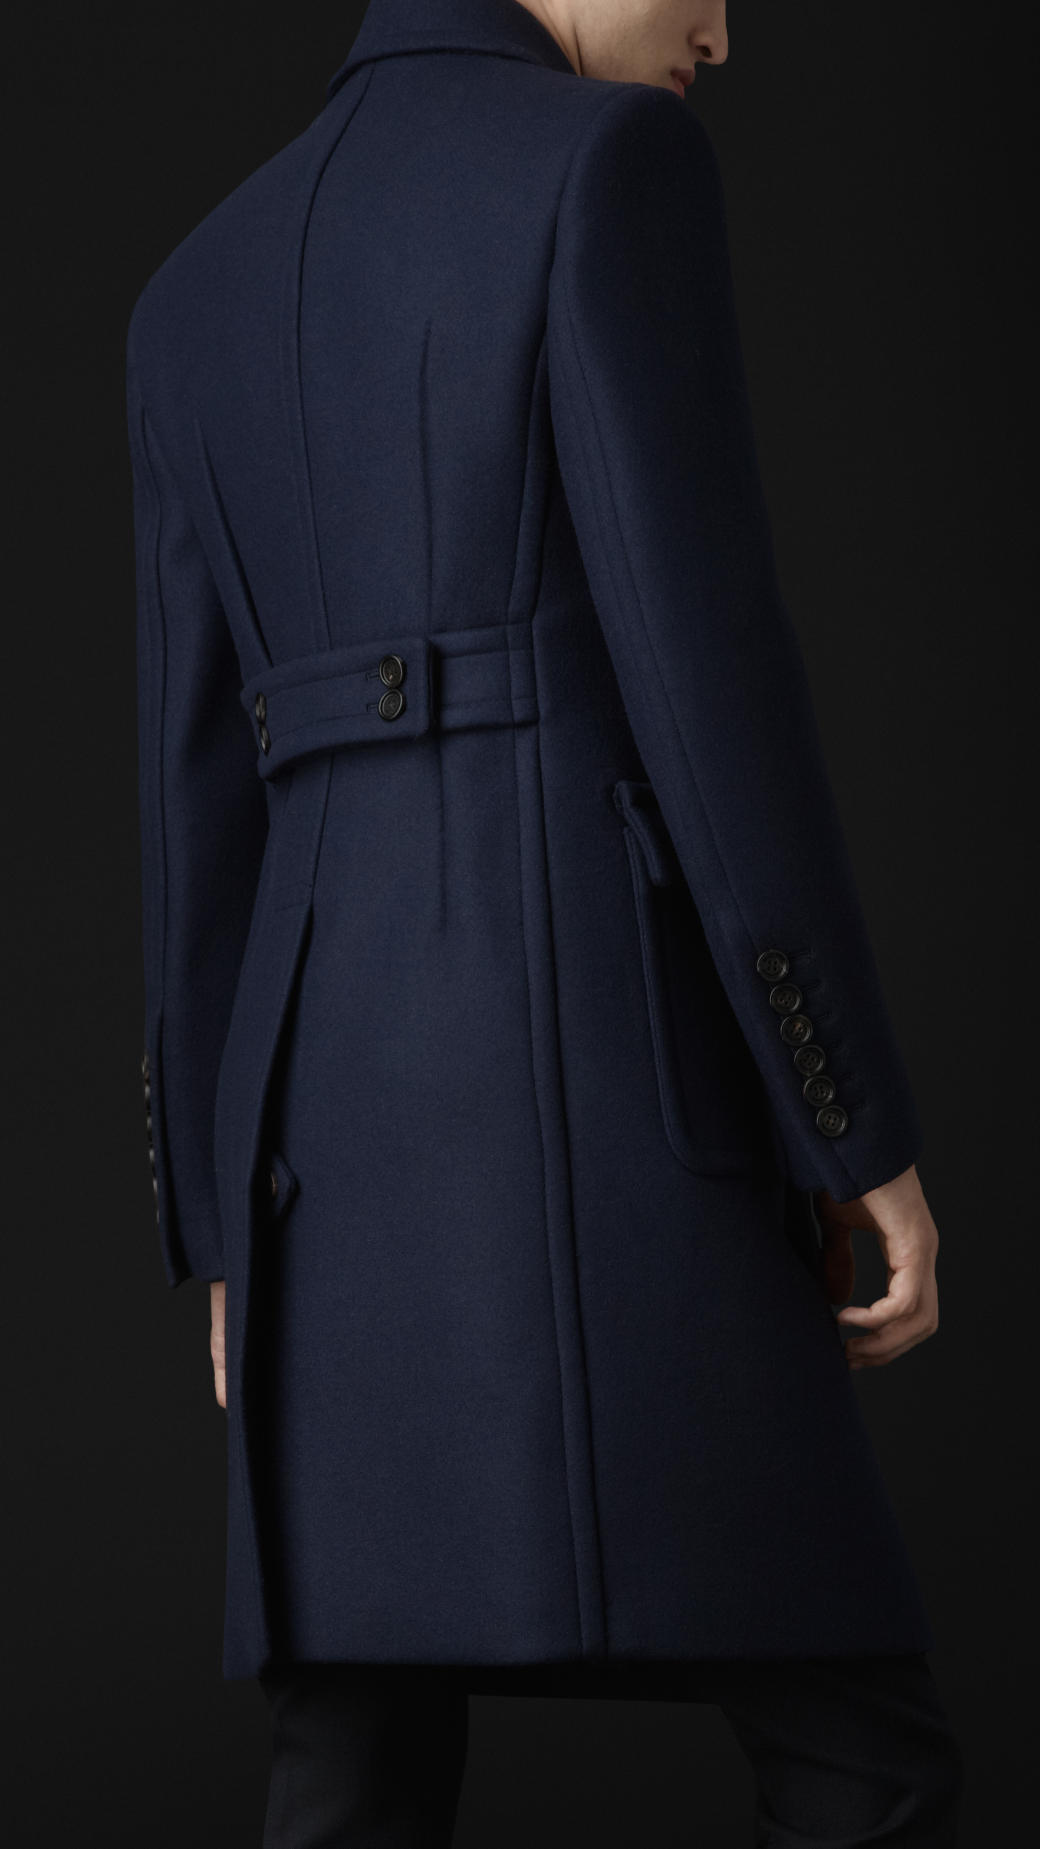 Lyst Burberry Prorsum Wool Felt Tailored Coat In Blue